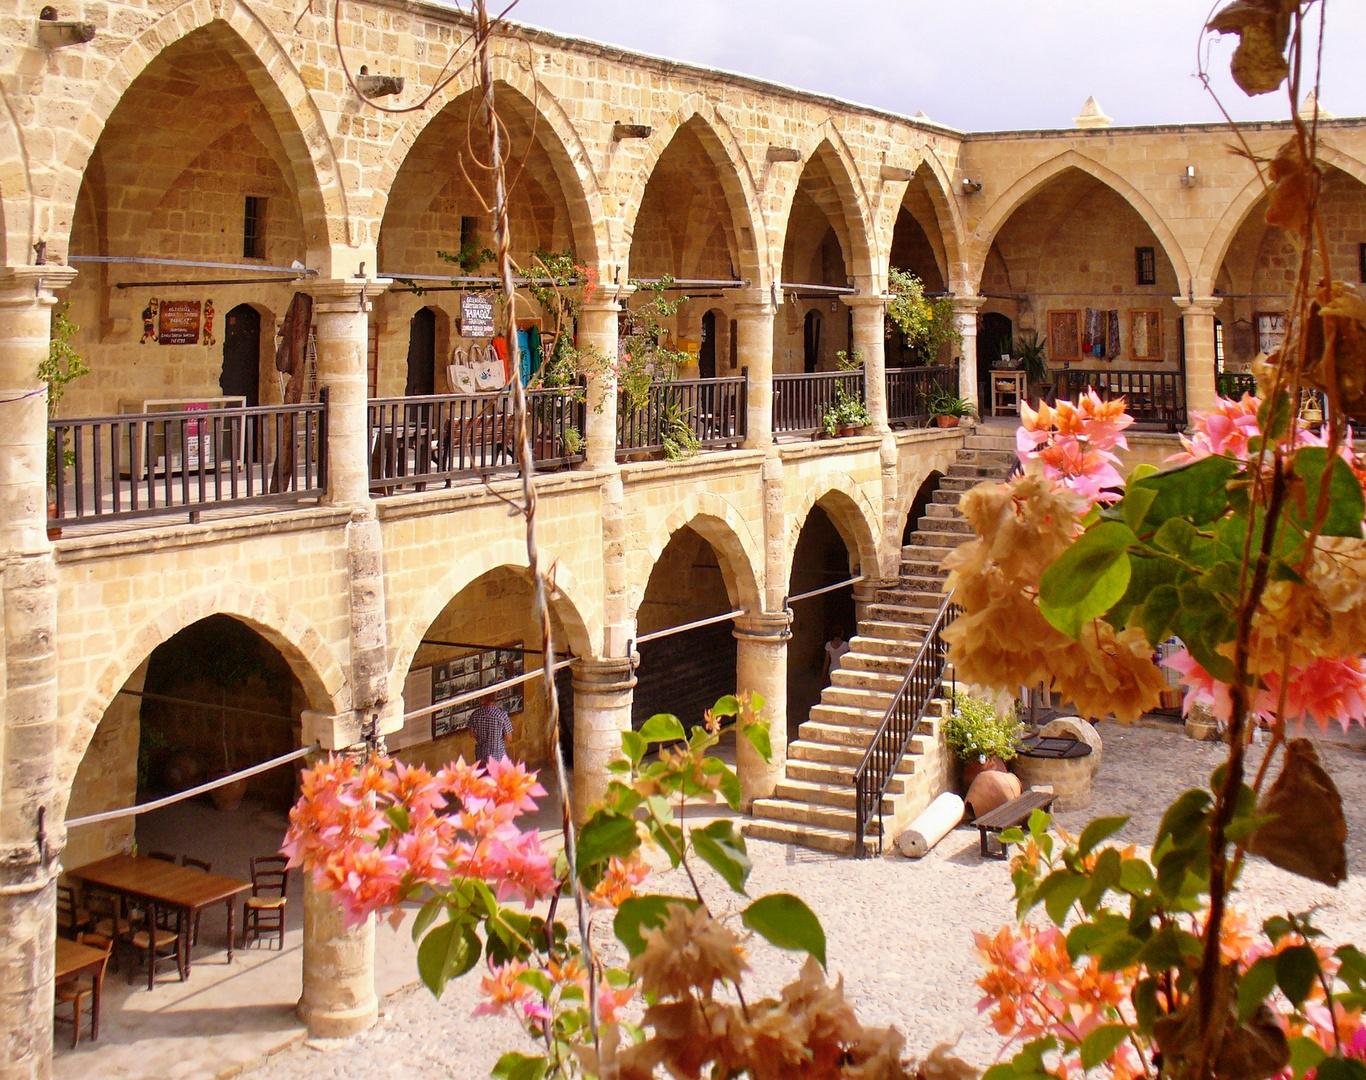 Großer Khan - Nikosia ( Lefkosia ), Zypern